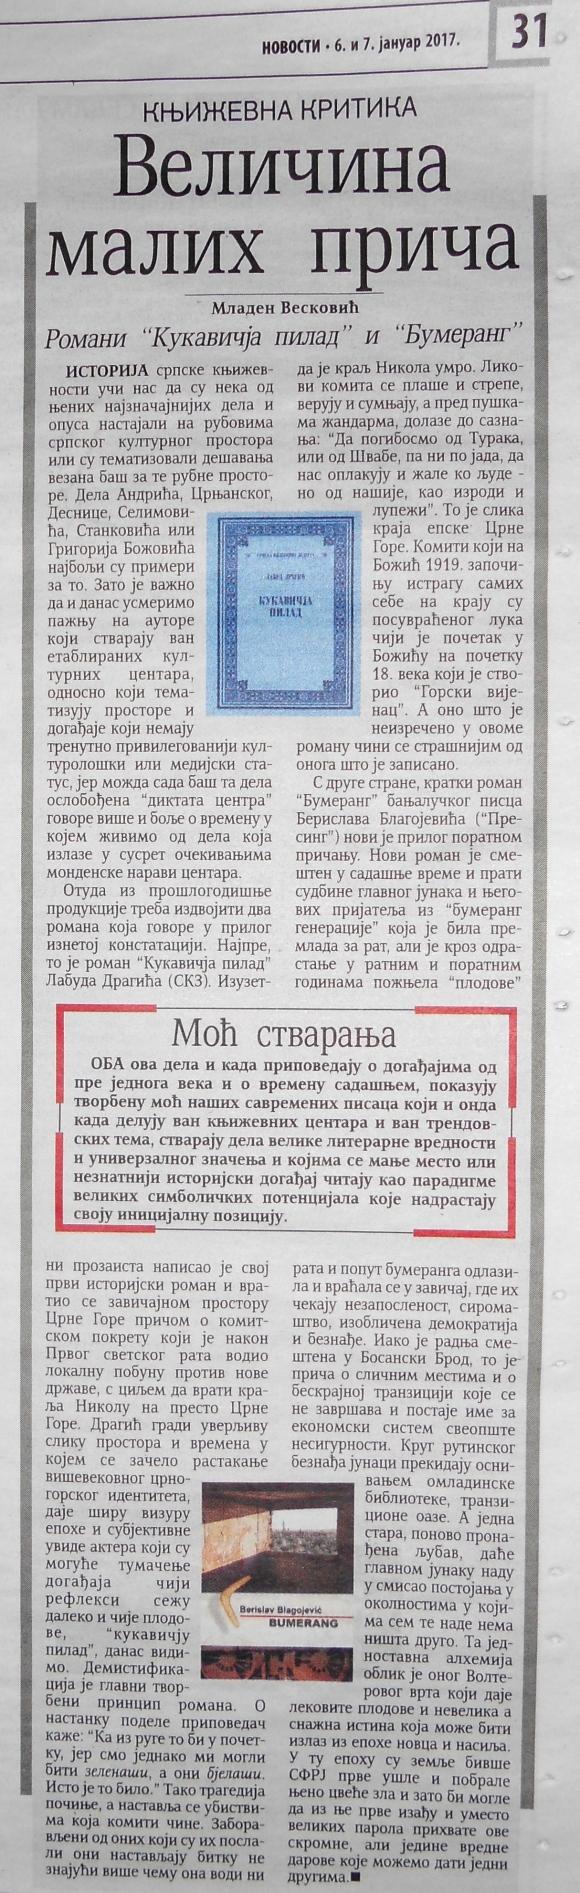 vecernje-novosti-januar-2017